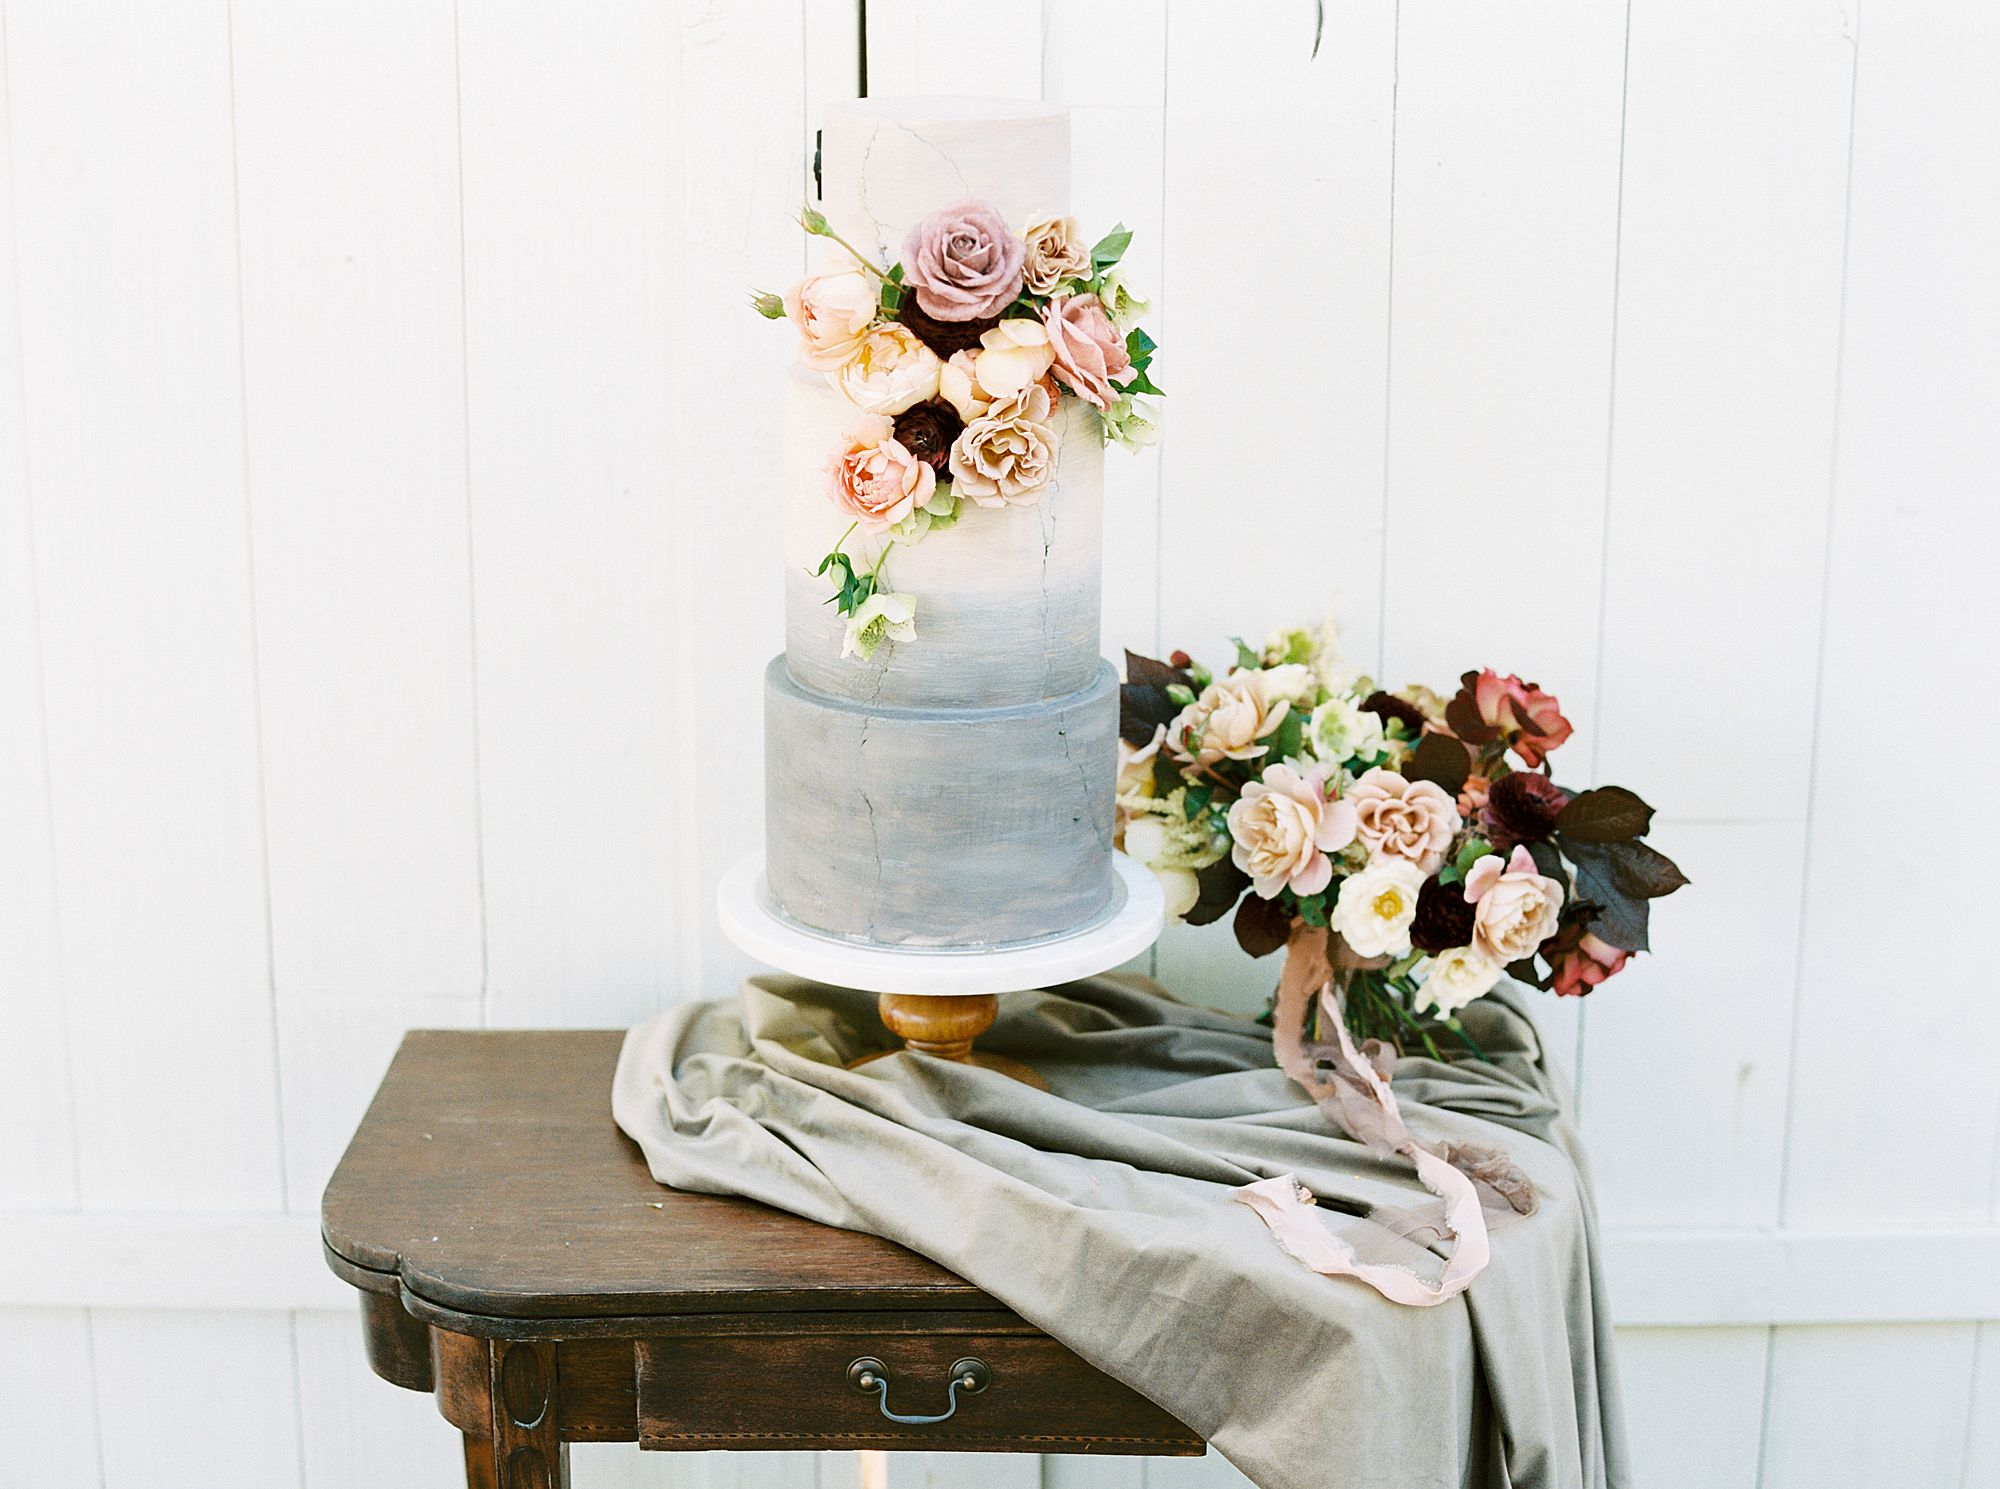 HammerSky Wedding Inspiration Featured on Hey Wedding Lady with Vanessa Noel Events - Ashley Baumgartner - SLO Wedding Photographer_0038.jpg